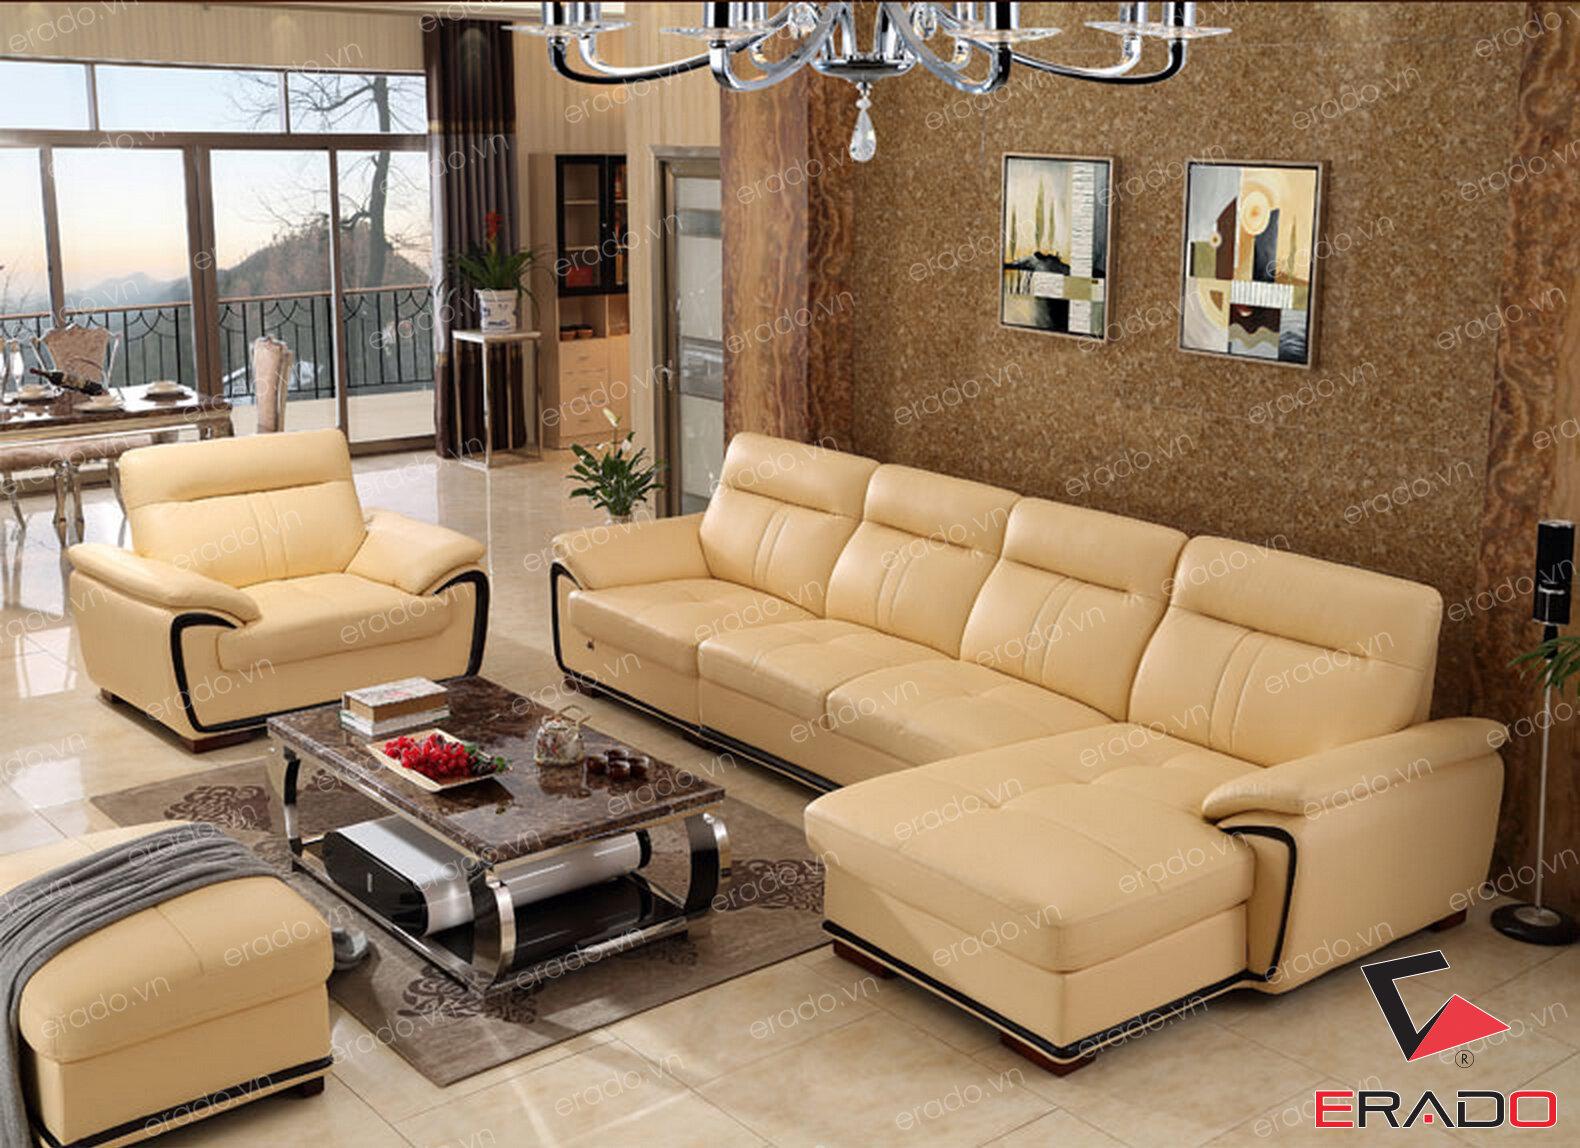 Sofa da mã 340